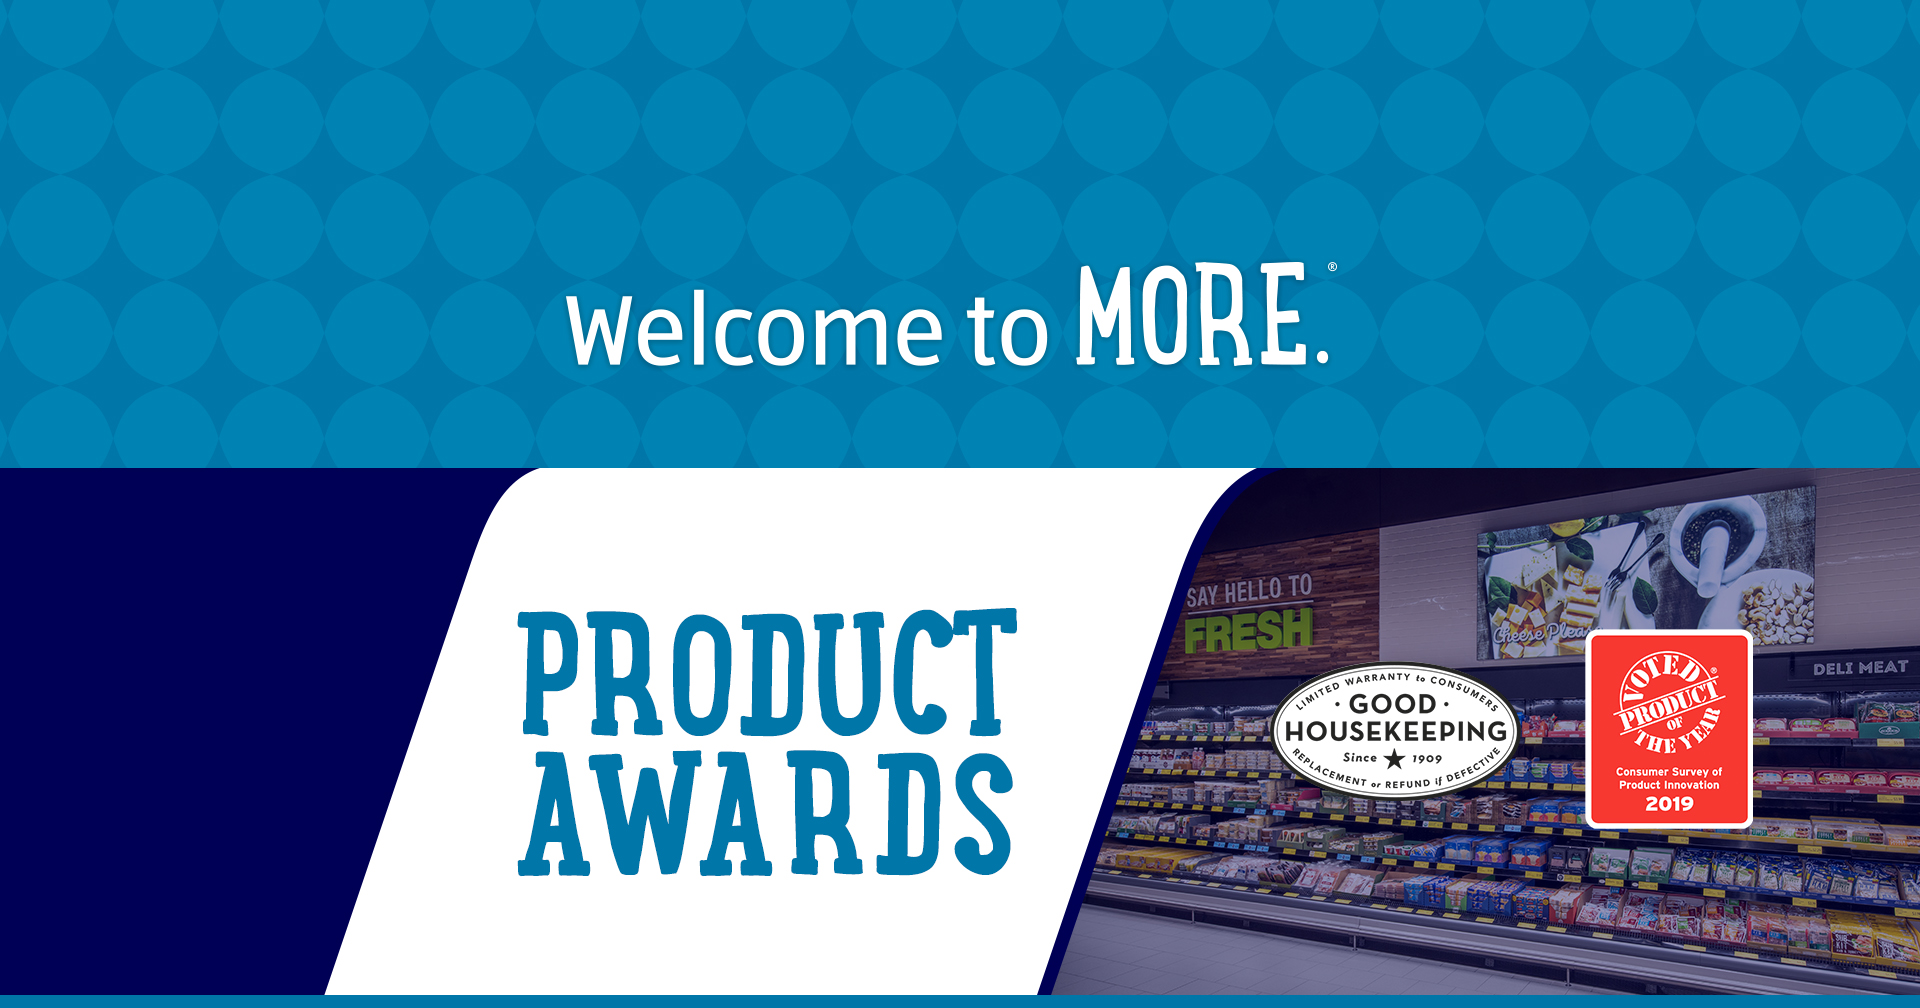 ALDI Product Awards